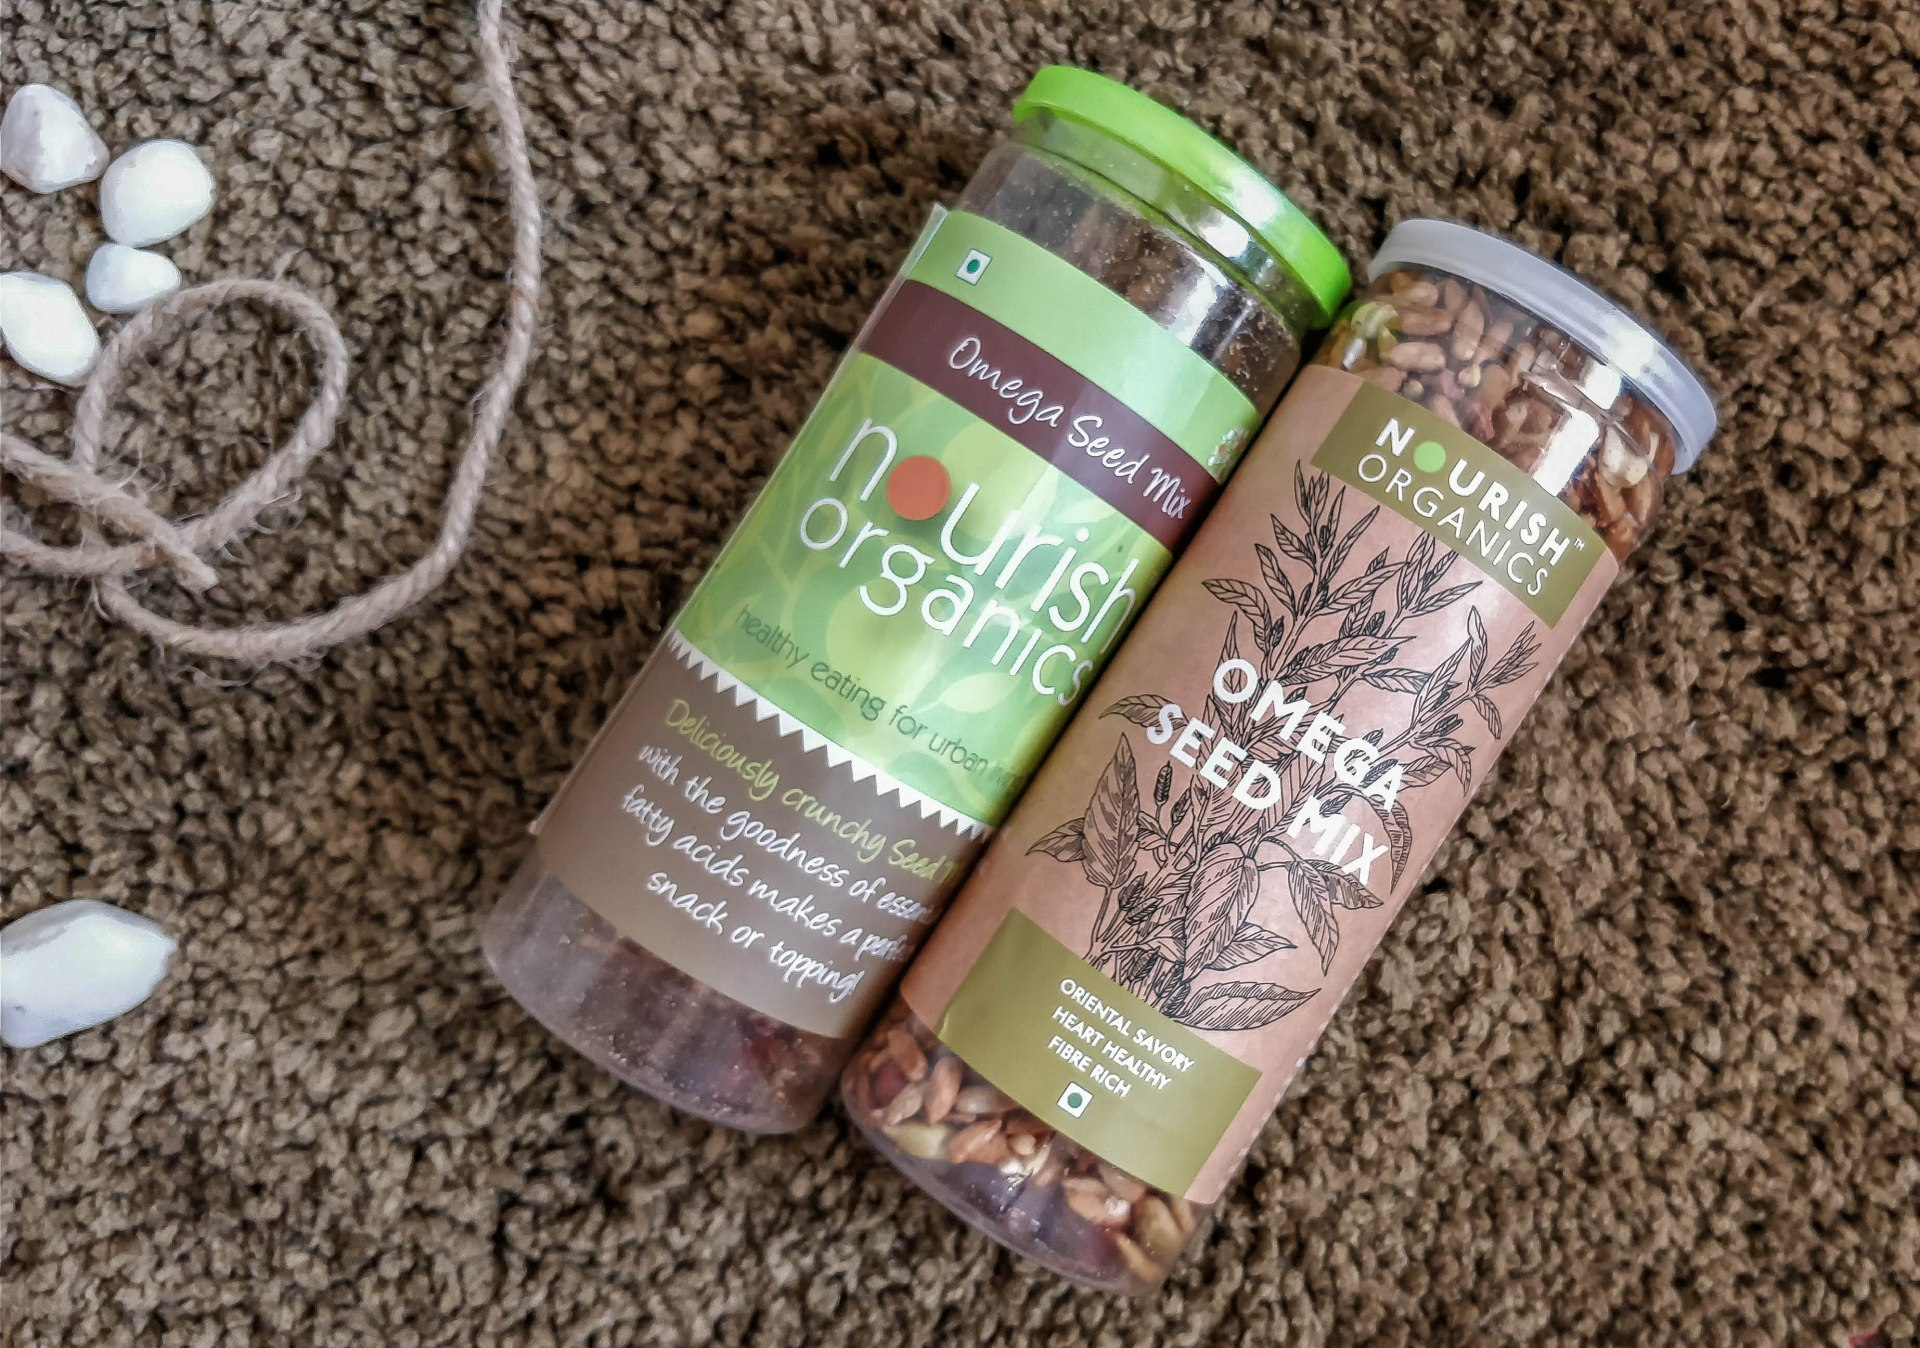 Nourish Organics Seed Mix